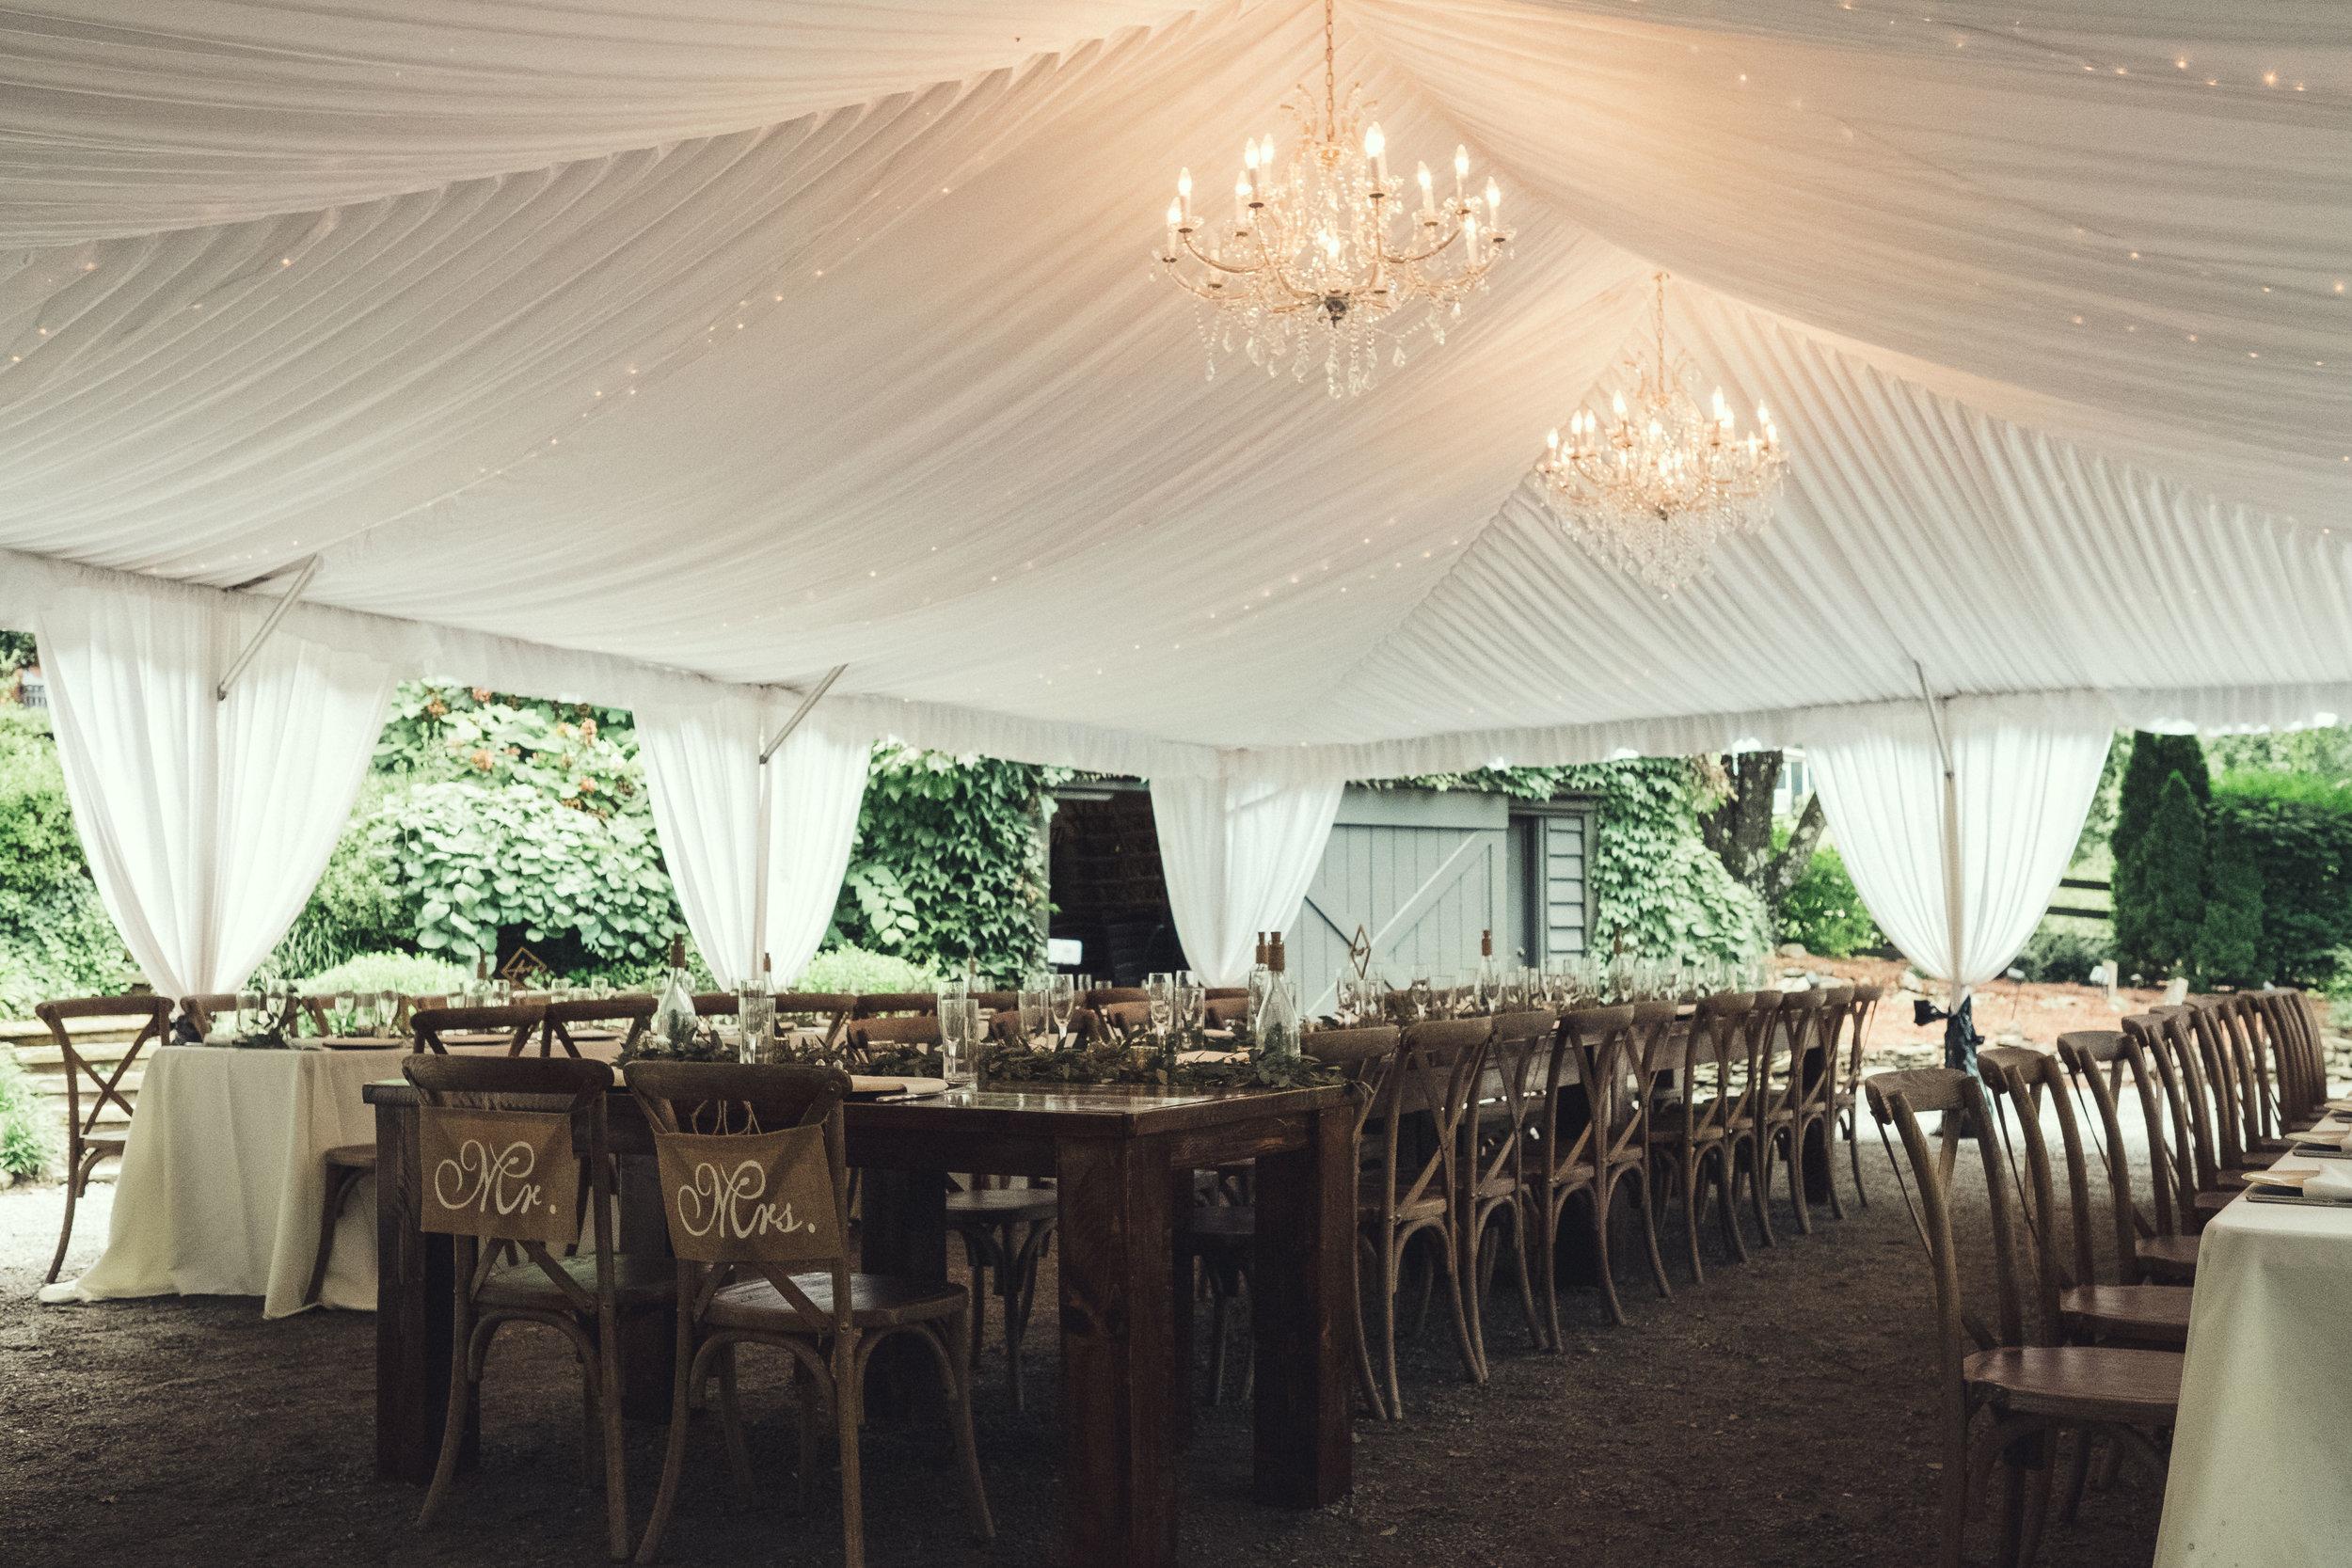 Hawkesdene reception tent interior